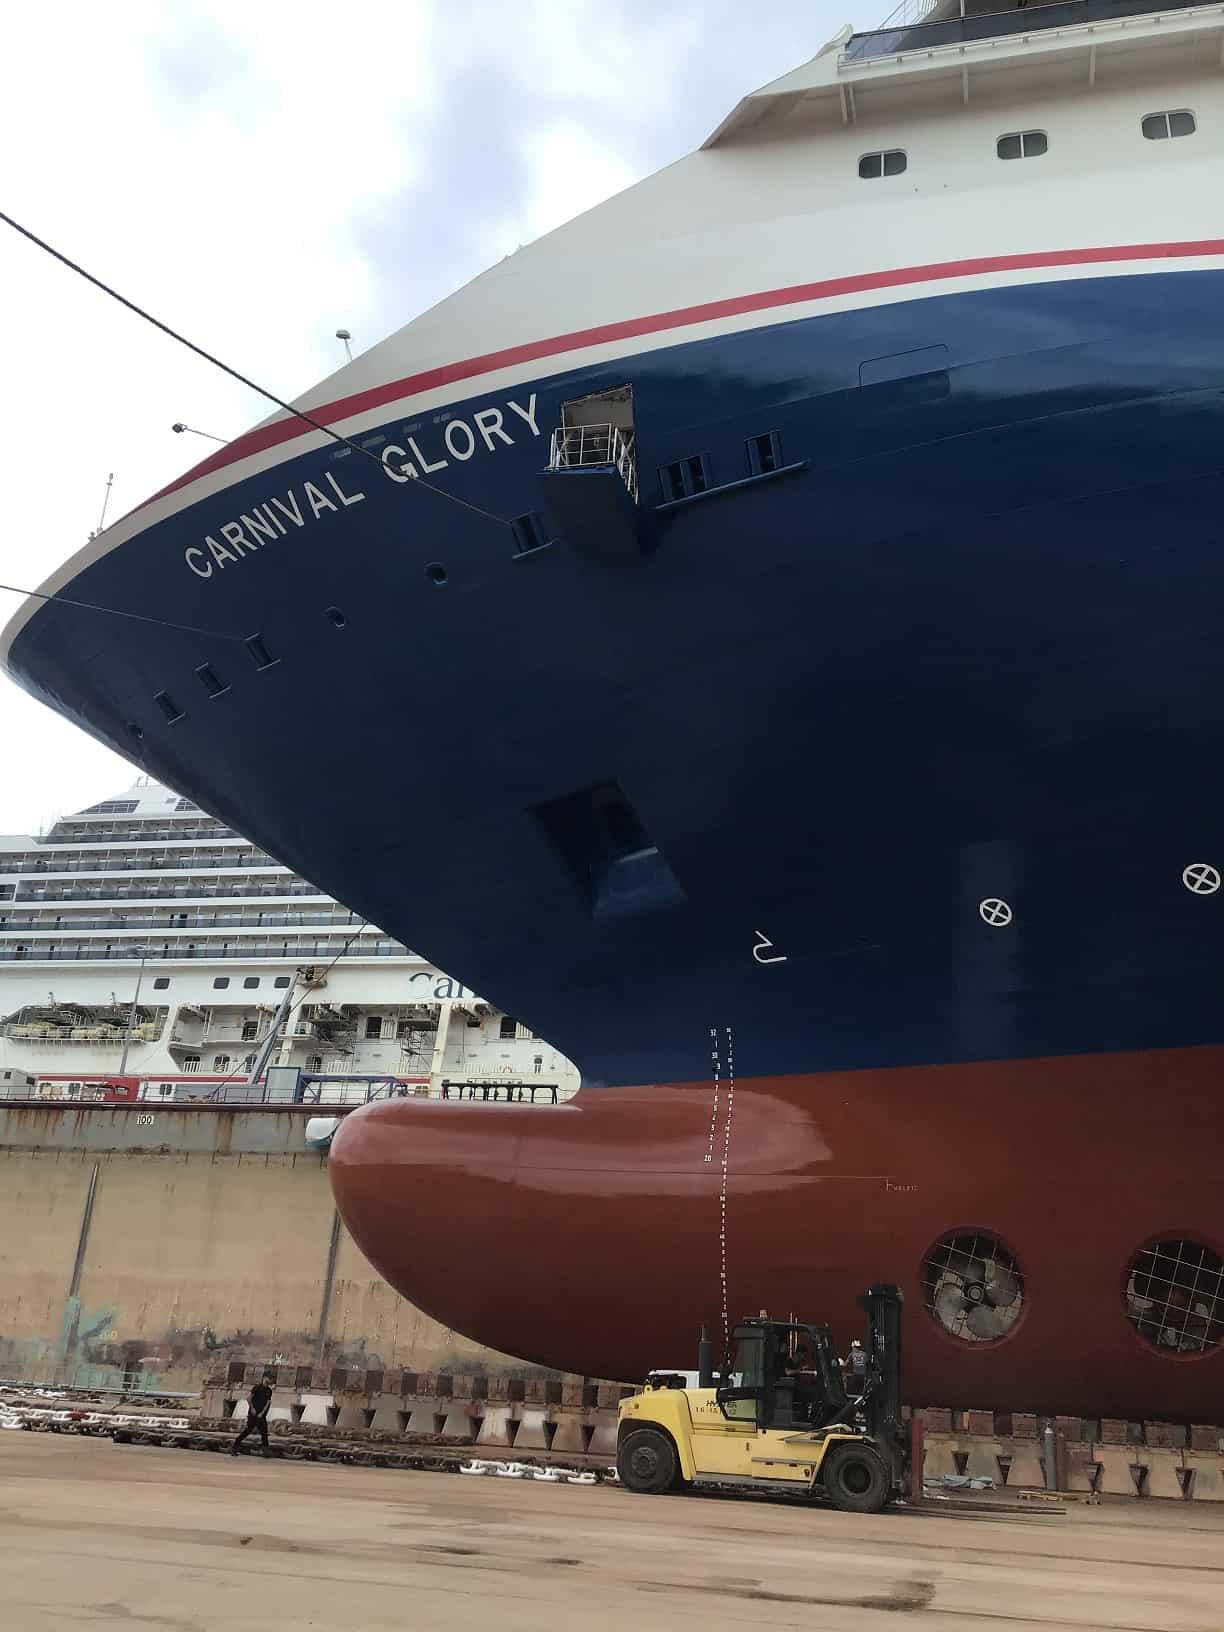 carnival cruise line glory